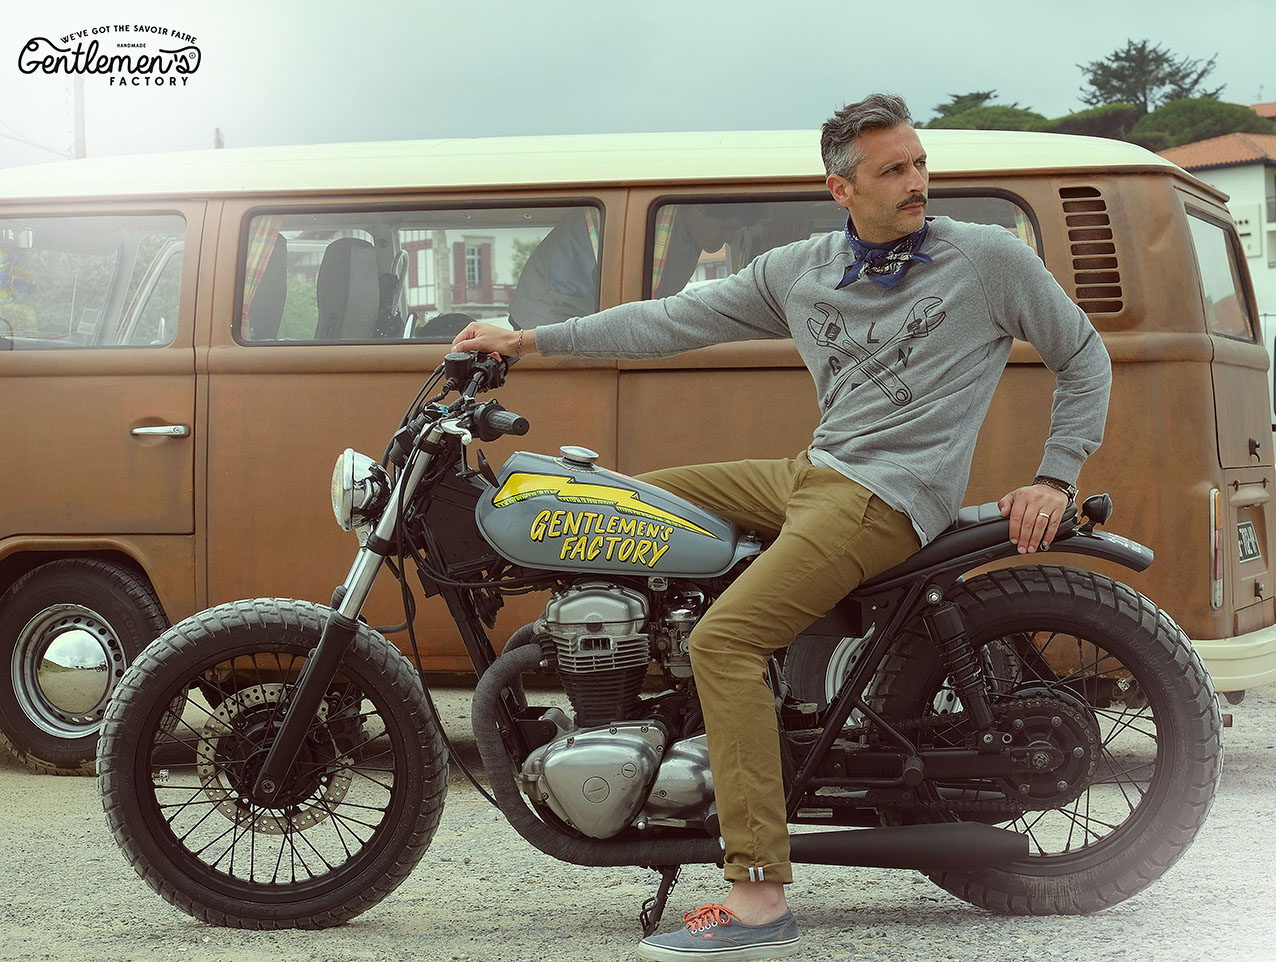 Laurent Scavone créateur de Gentlemen's Factory sur une Kawasaki w650, moto custom